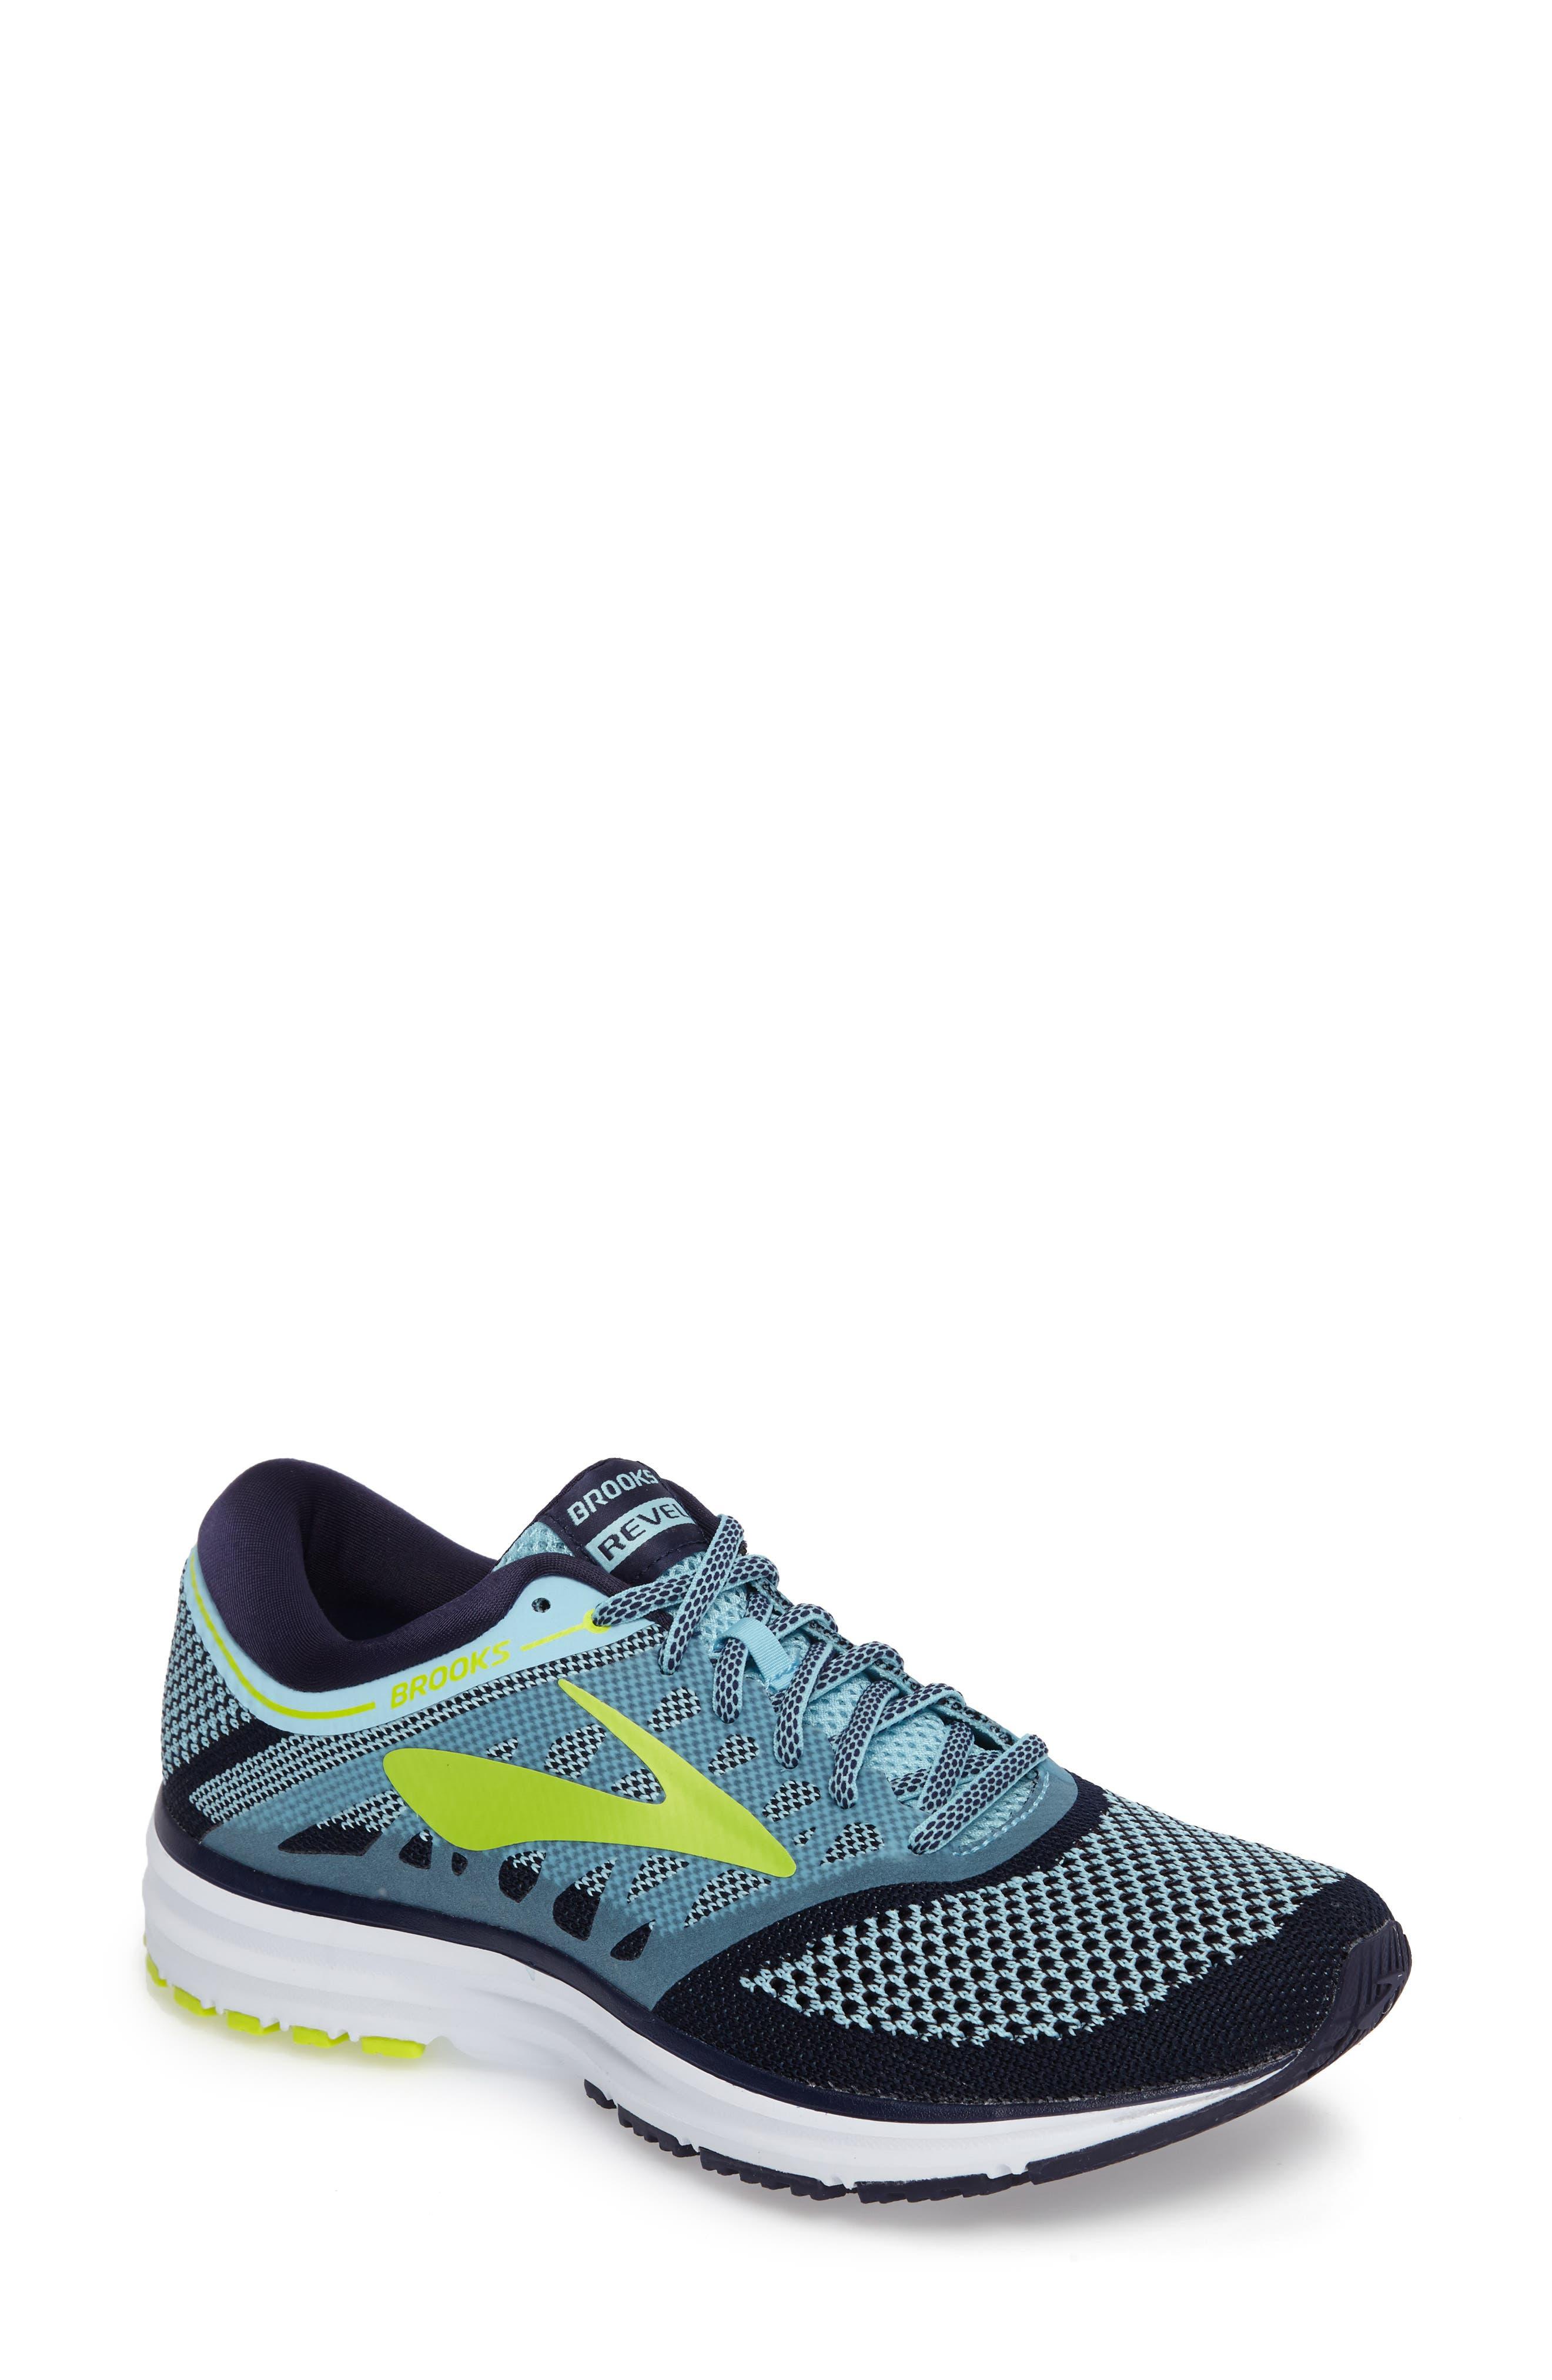 Revel Running Shoe,                             Main thumbnail 5, color,